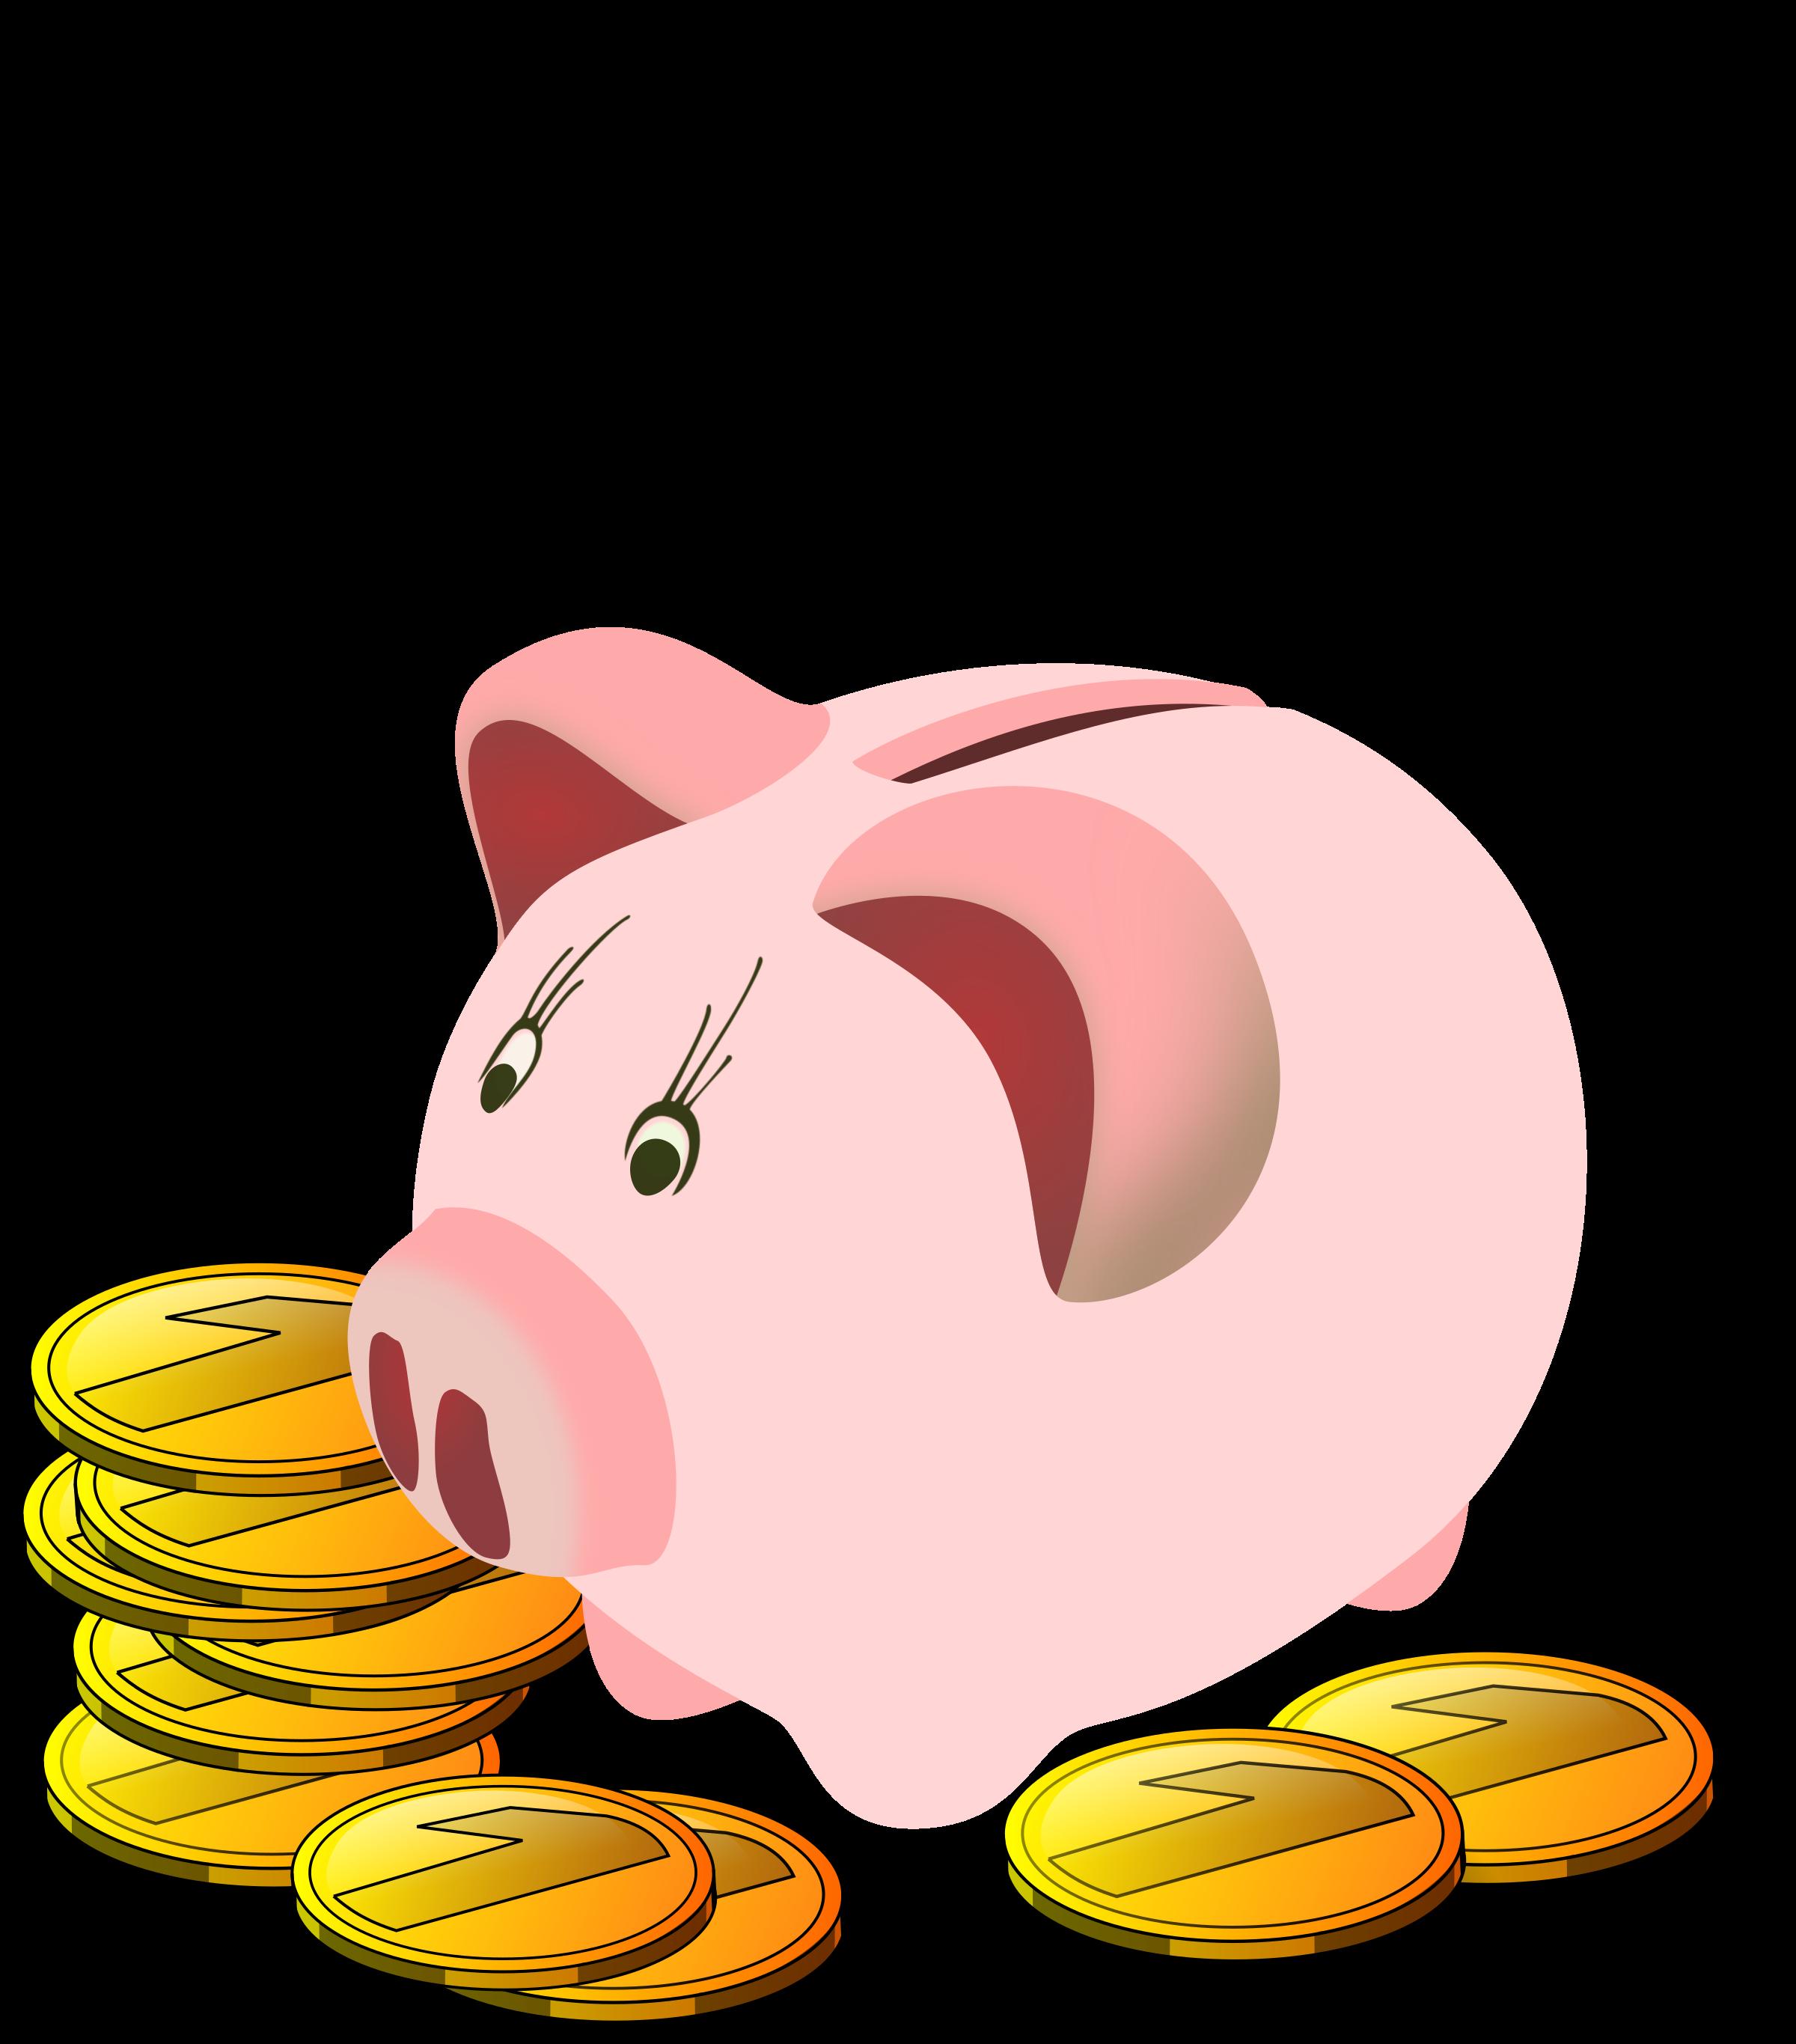 Piggy bank big image. Clipart money pig